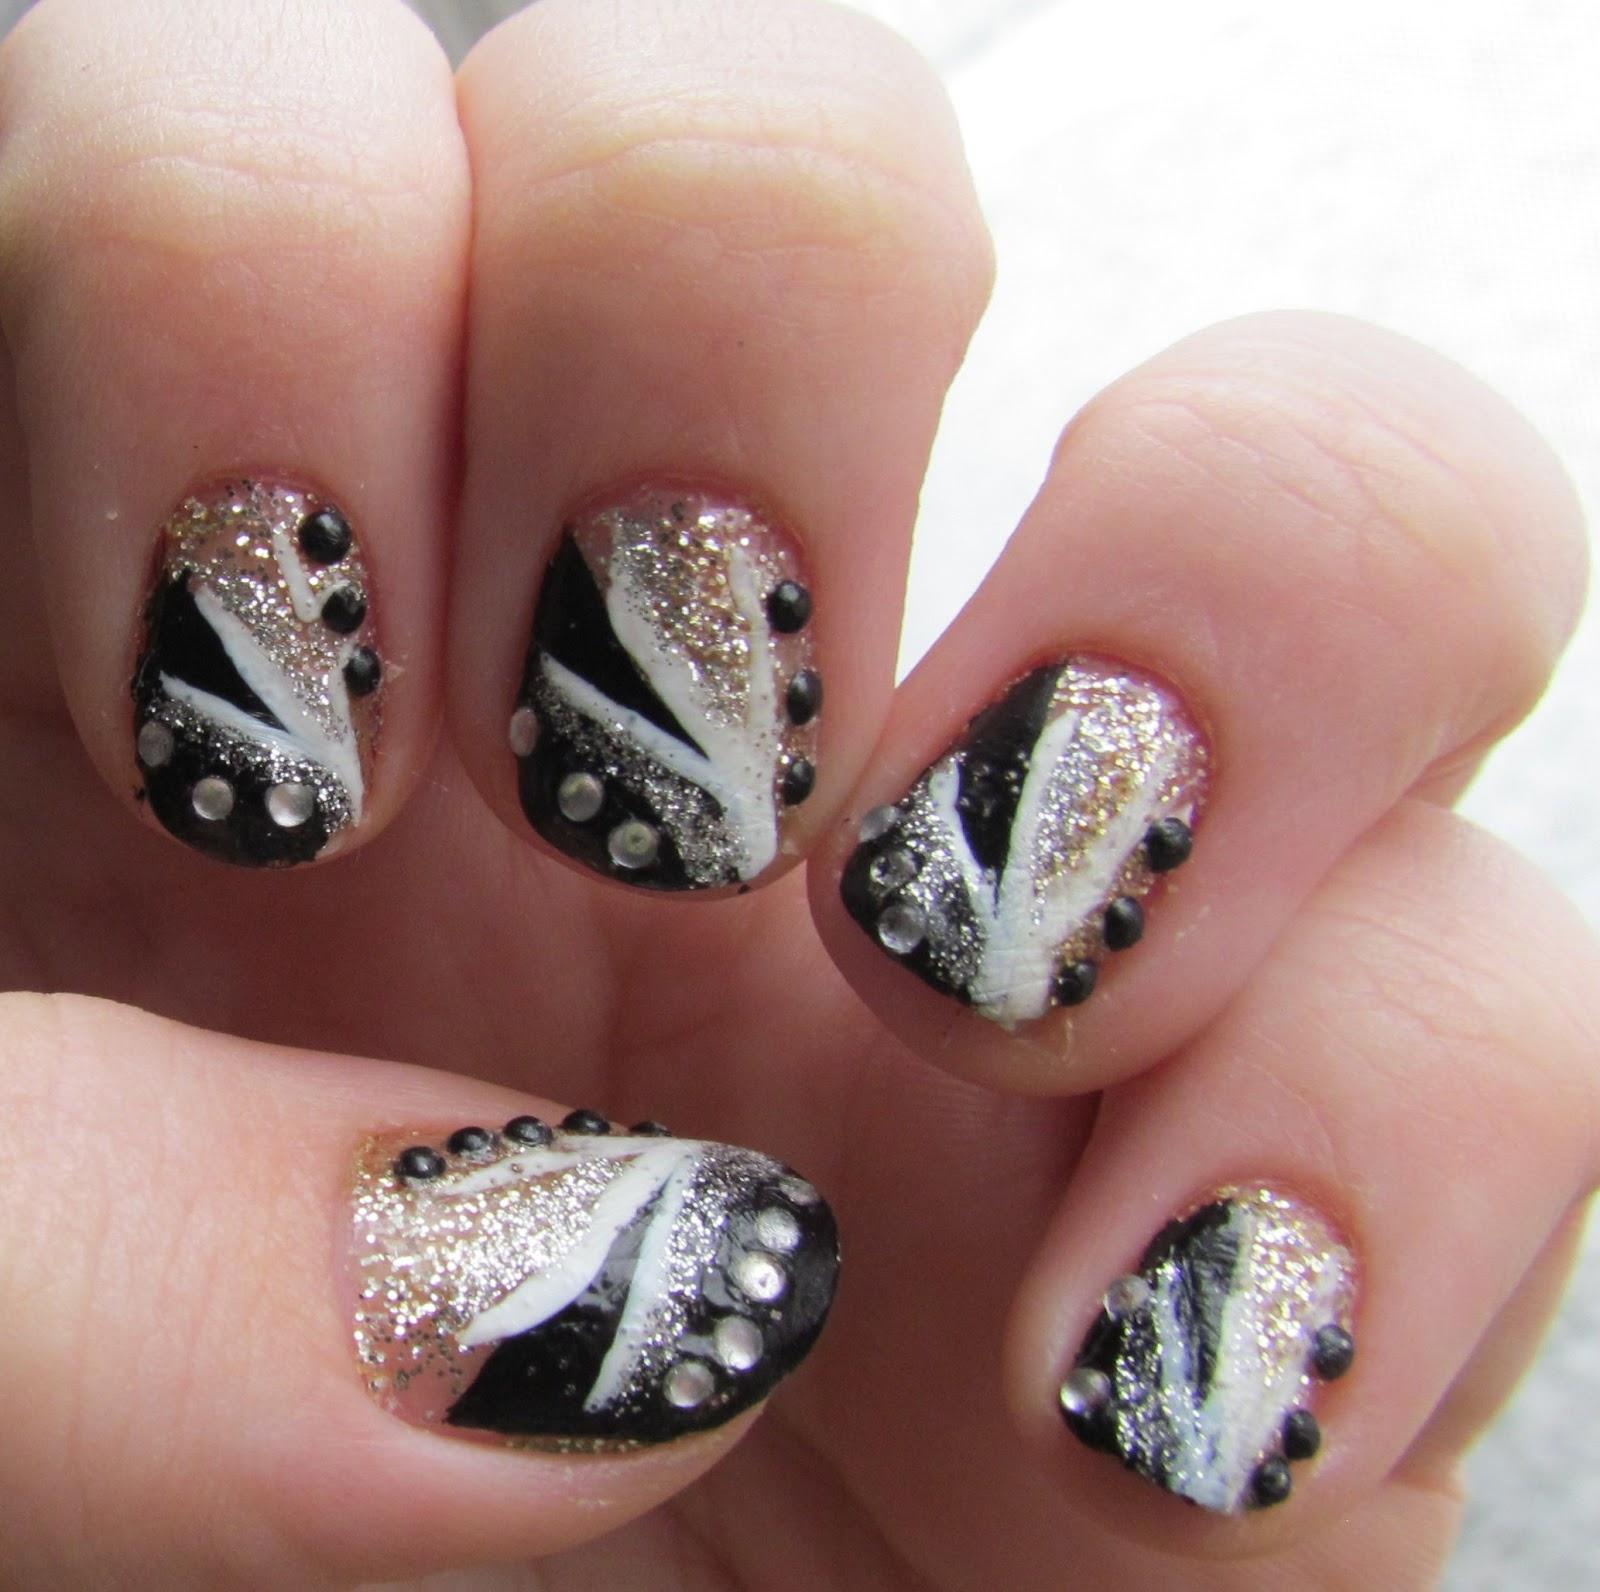 Modern White Stuff On Nails Ideas - Nail Art Ideas - morihati.com